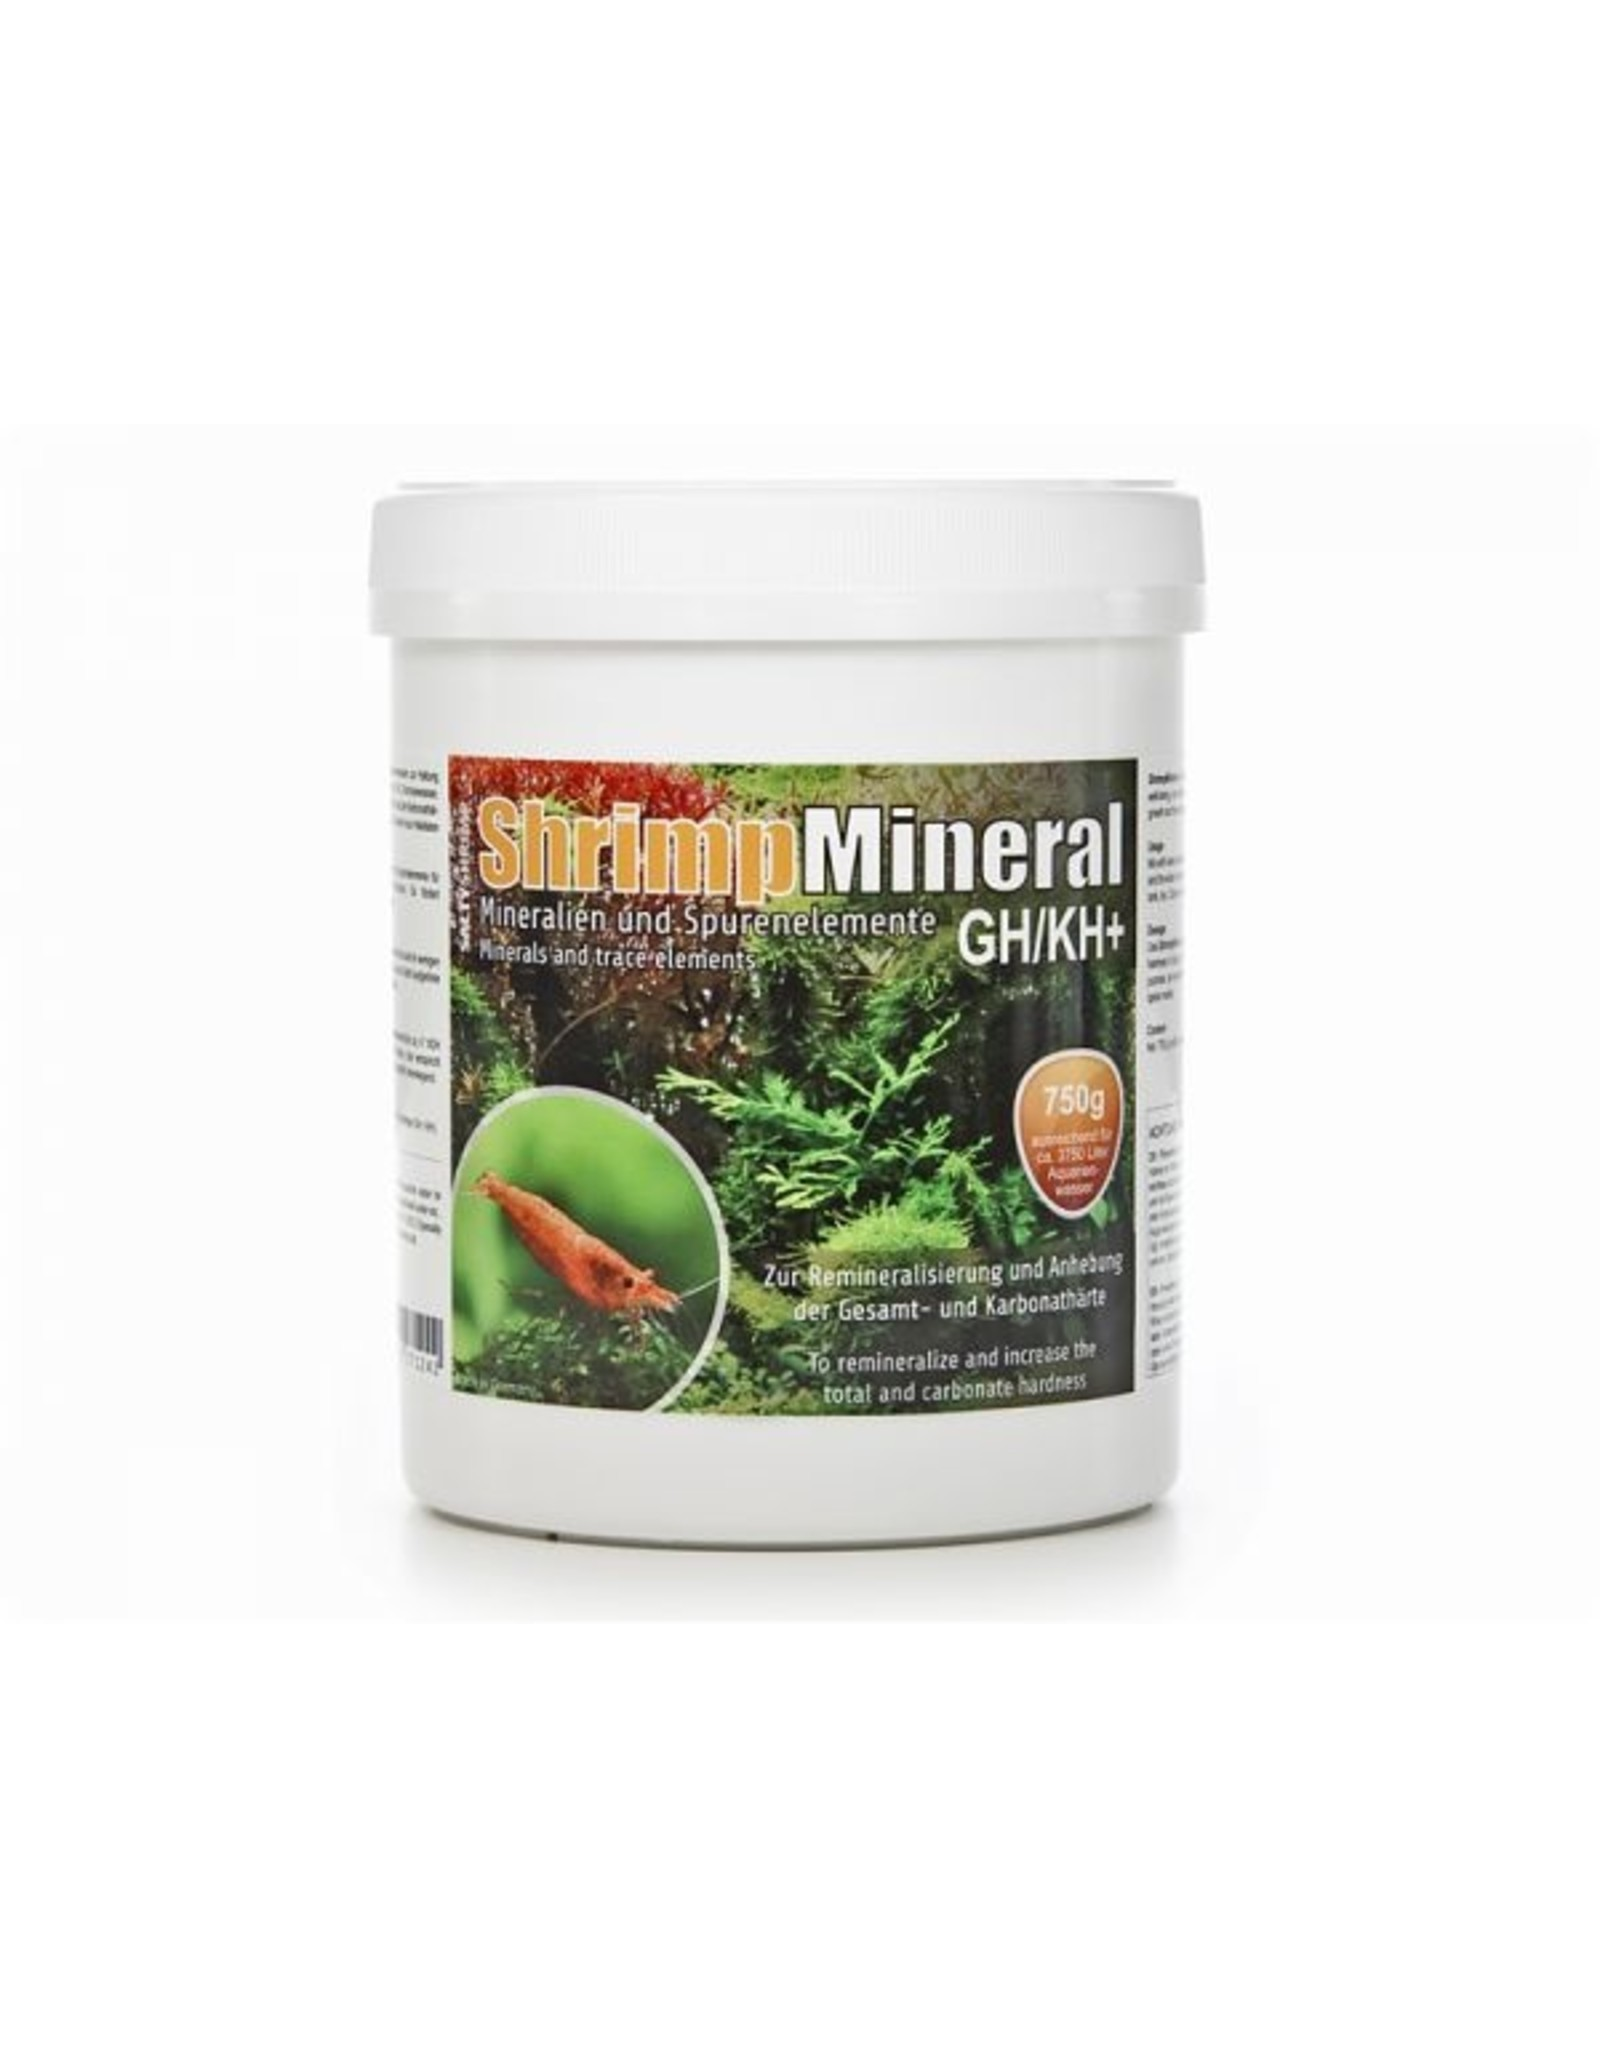 SaltyShrimp SALTYSHRIMP - Shrimp Mineral GH/KH+